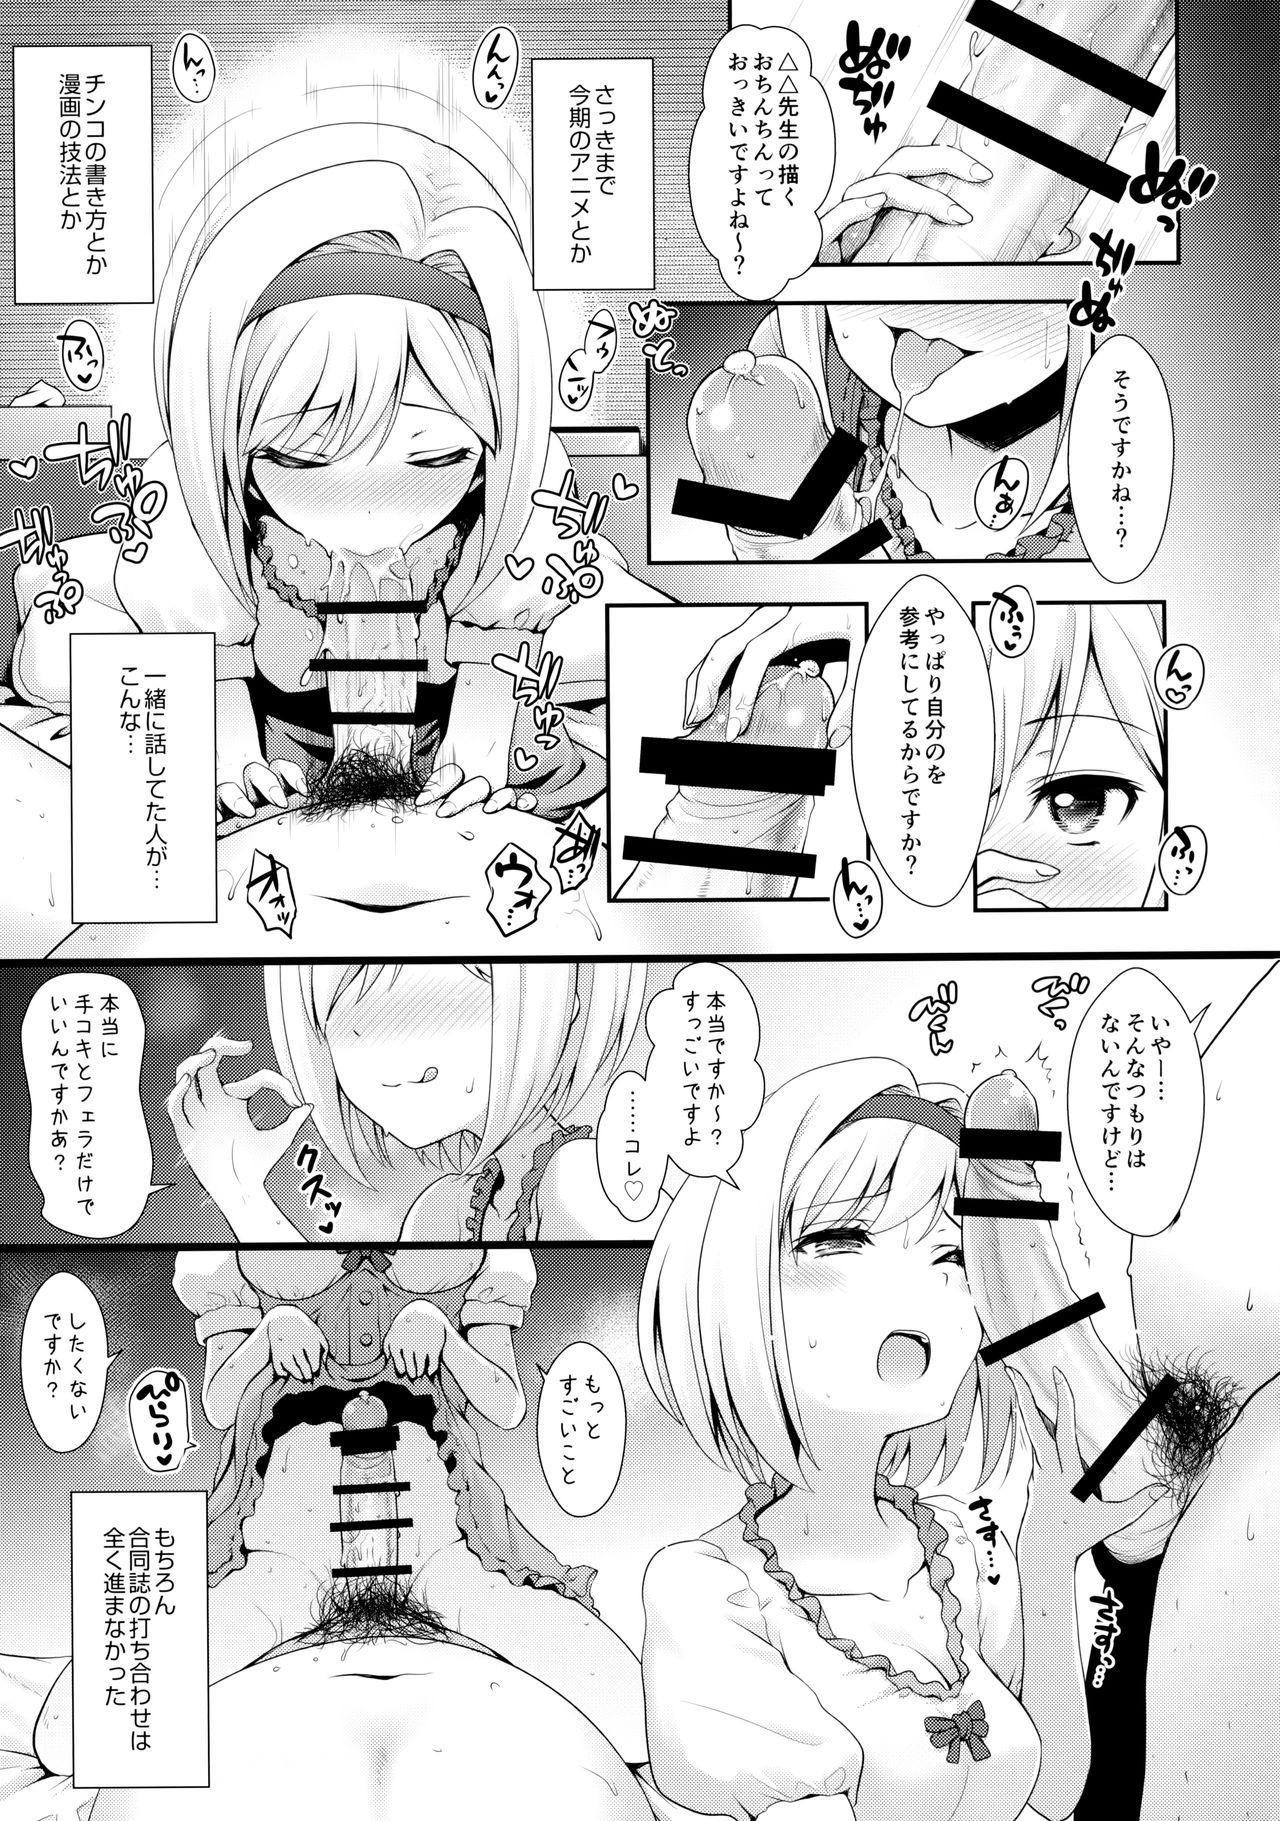 ○○ no Cosplay no Hito. 11